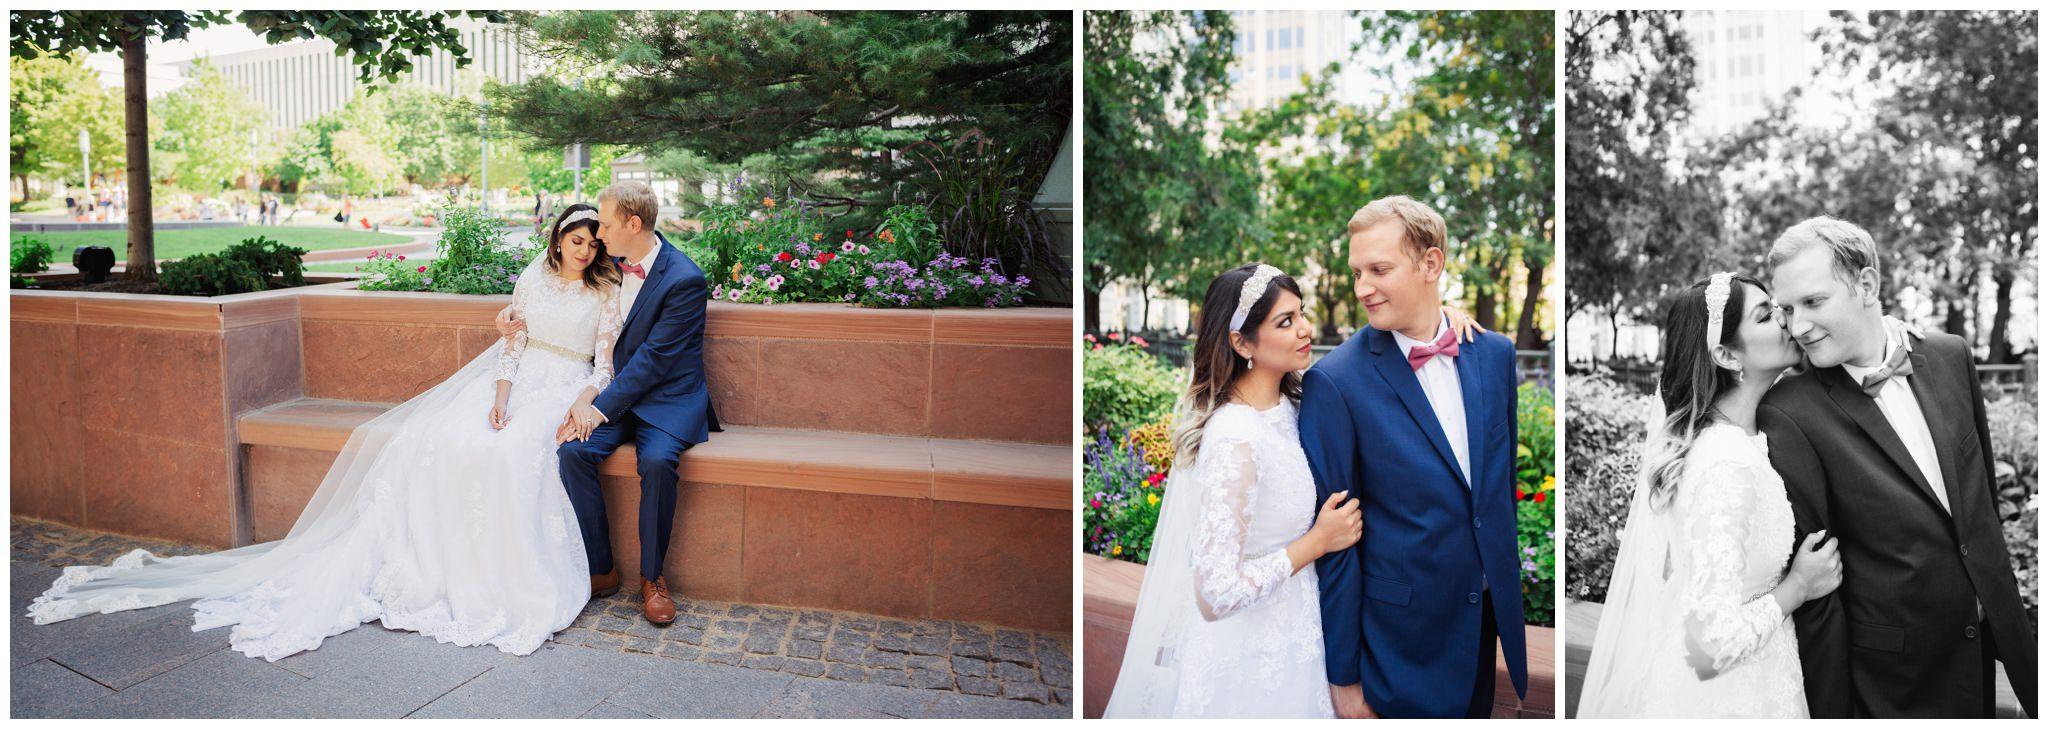 SLC Temple Wedding Formals